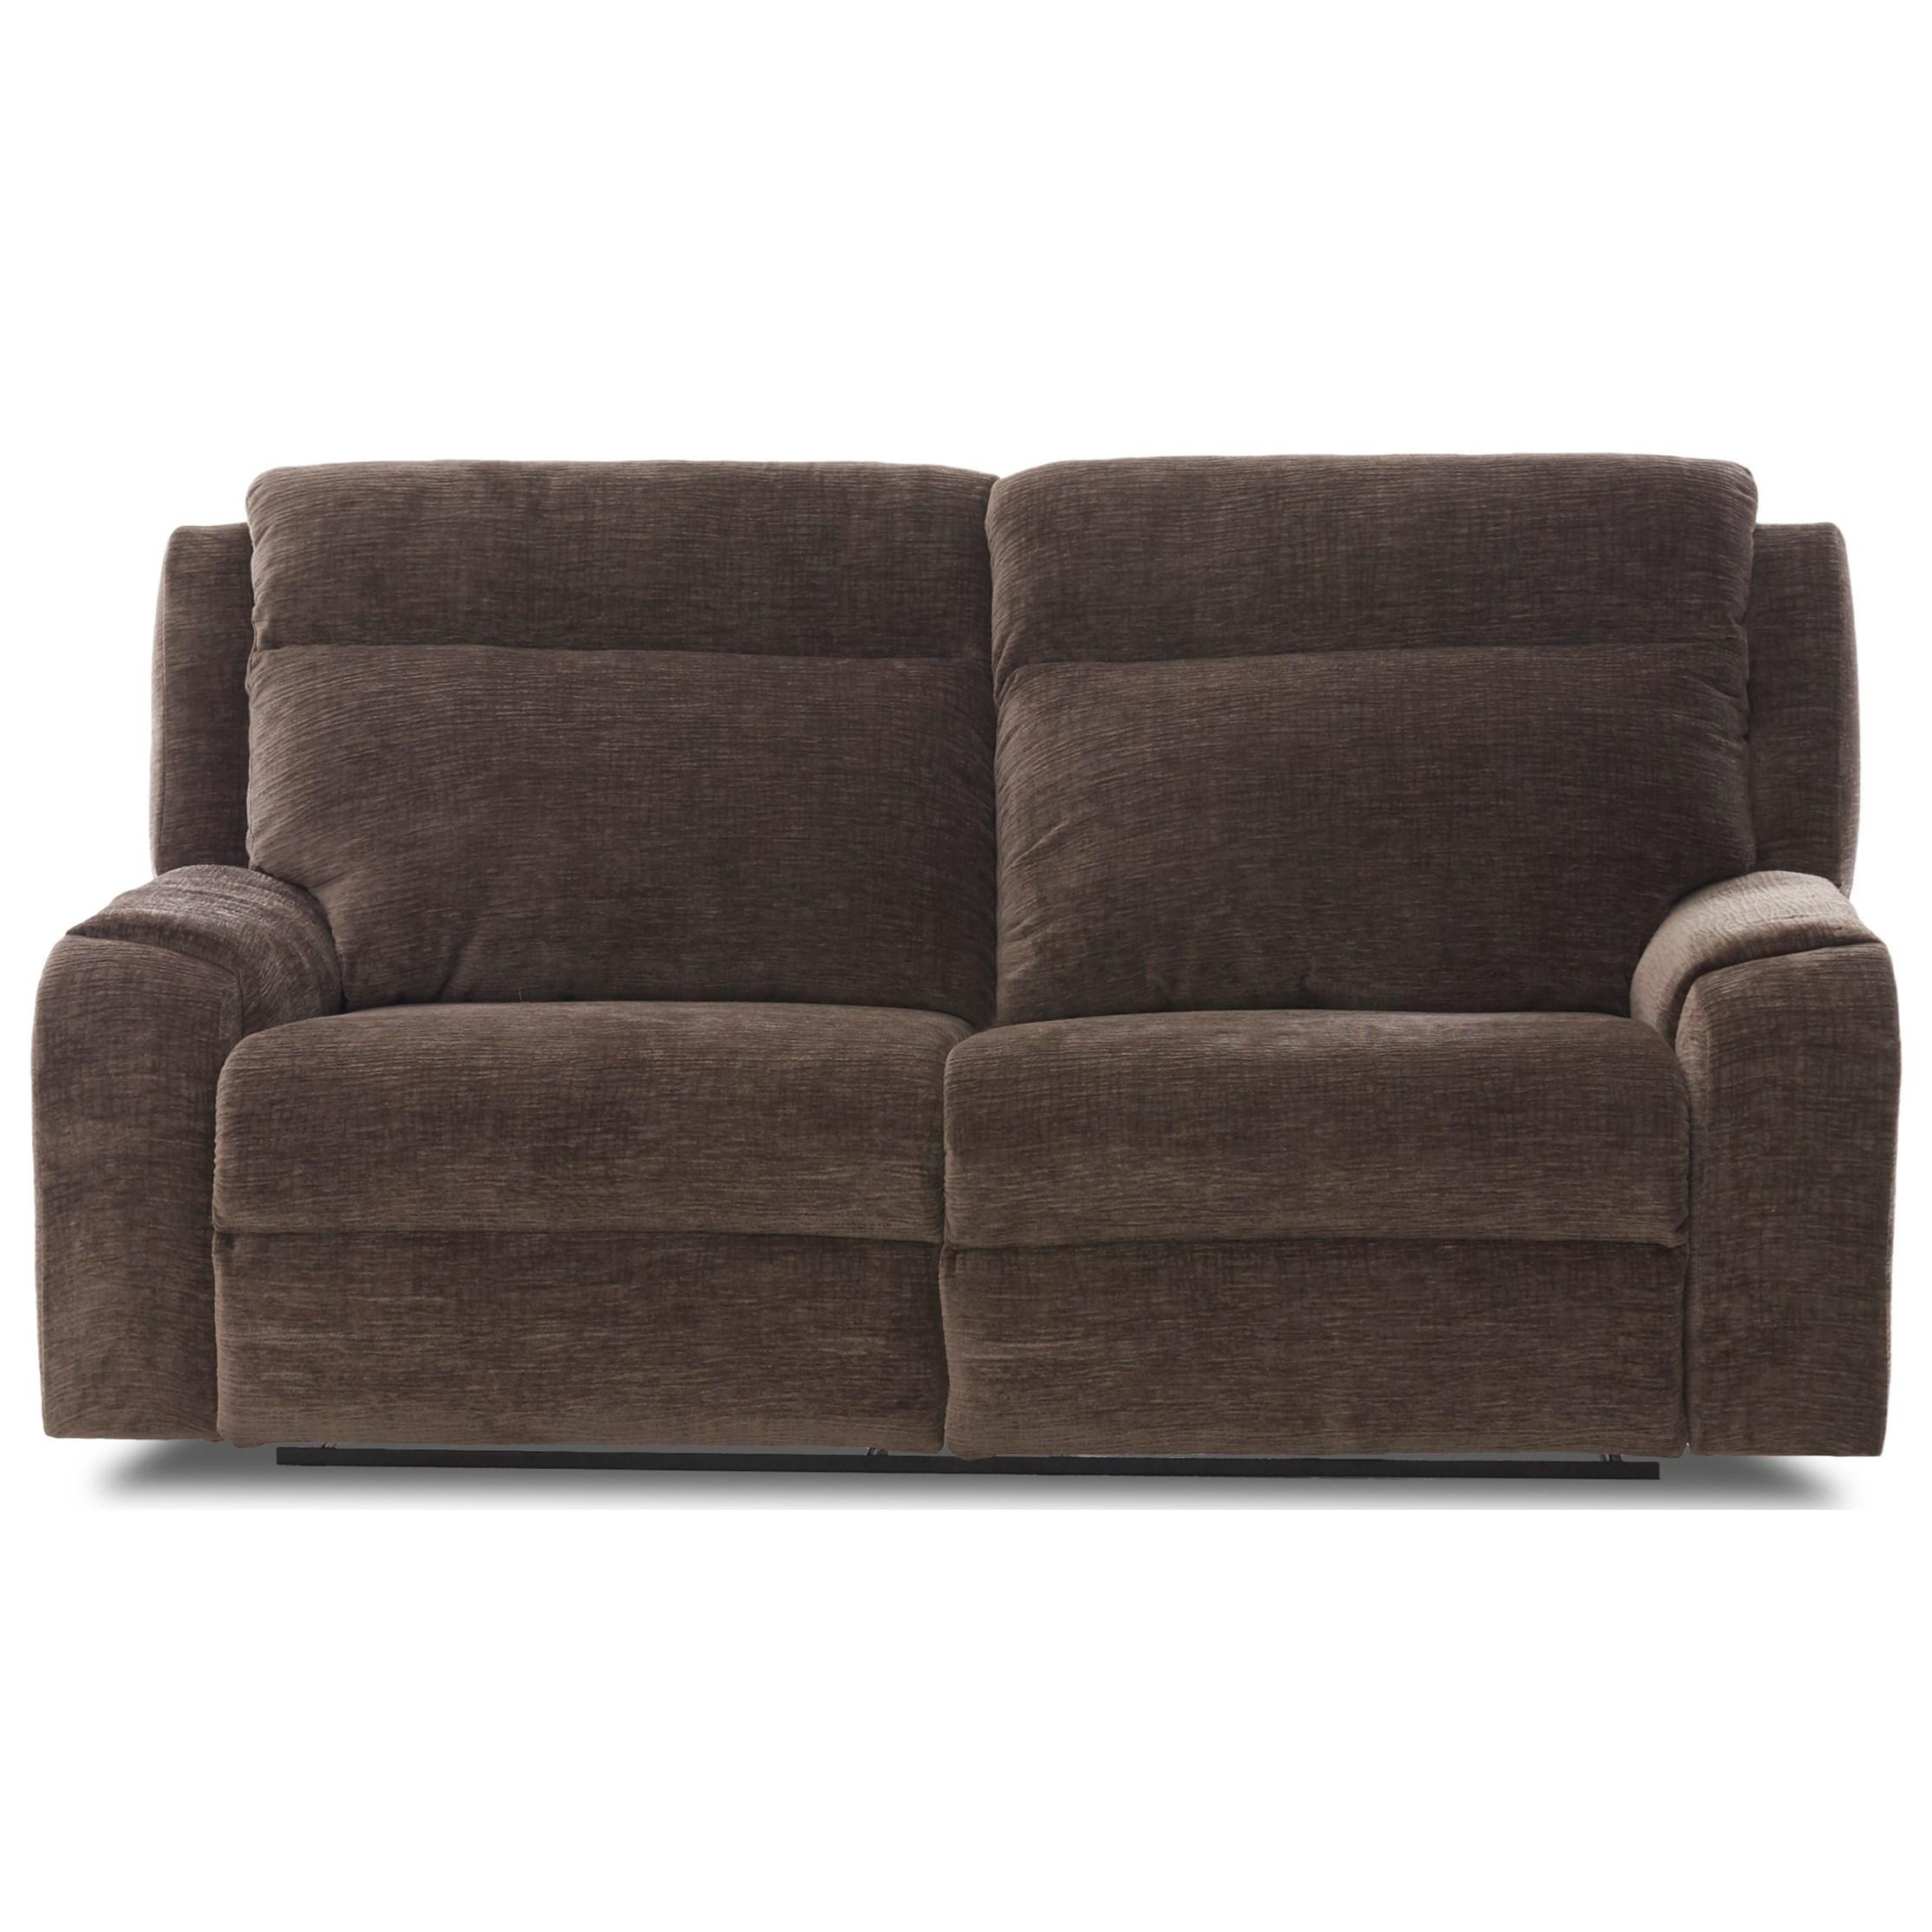 Reclining Sofa-2 over 2